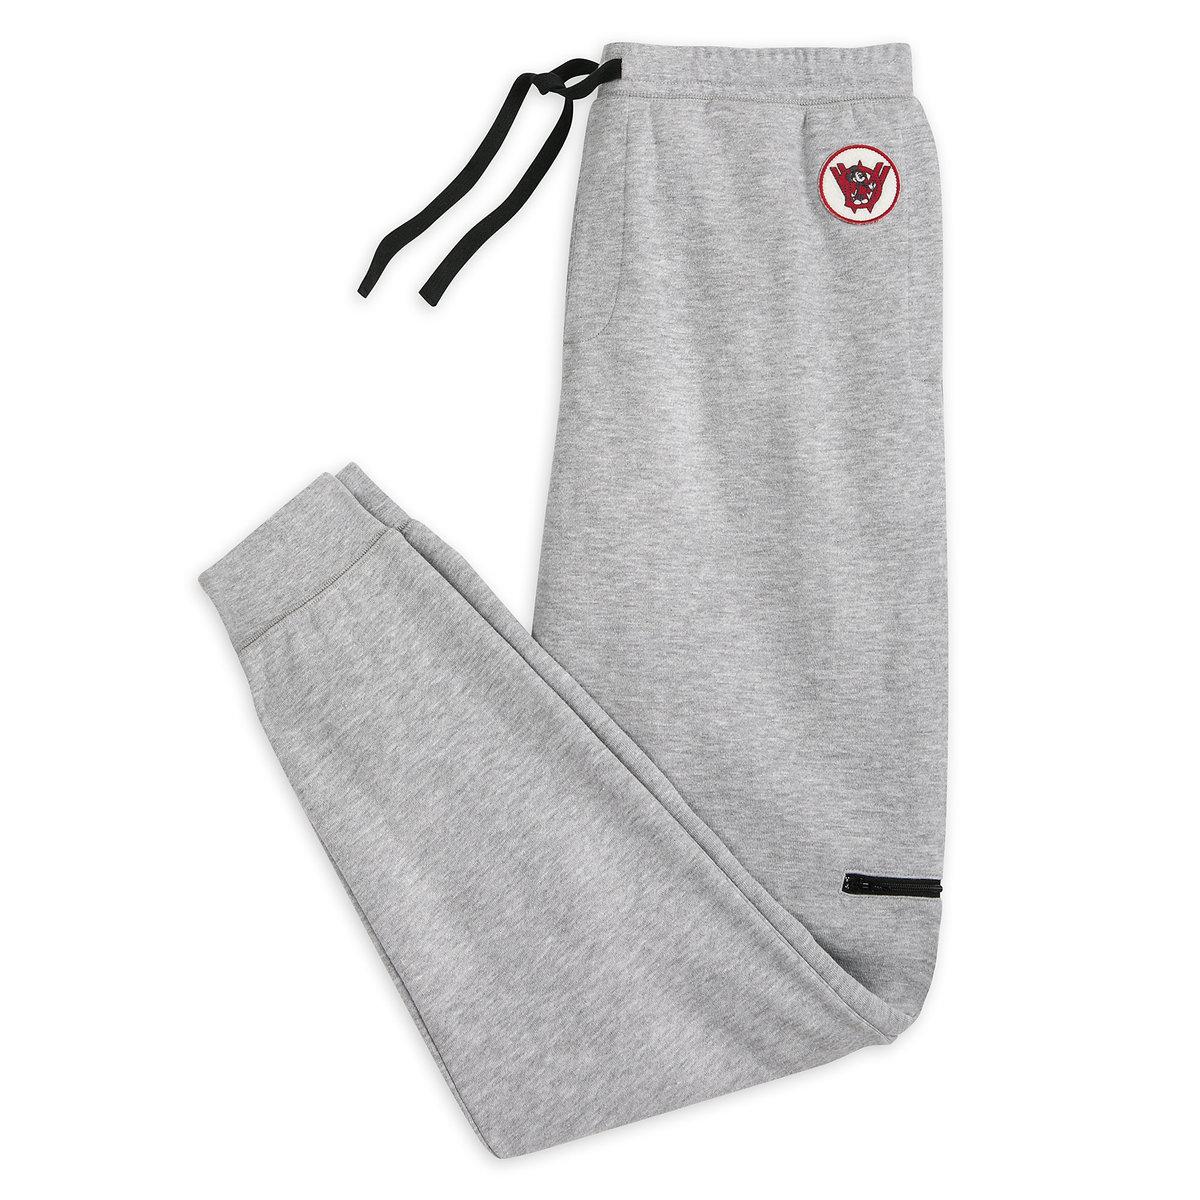 8c01c9fd2 Product Image of Walt Disney World Jogger Pants for Men by Junk Food # 1